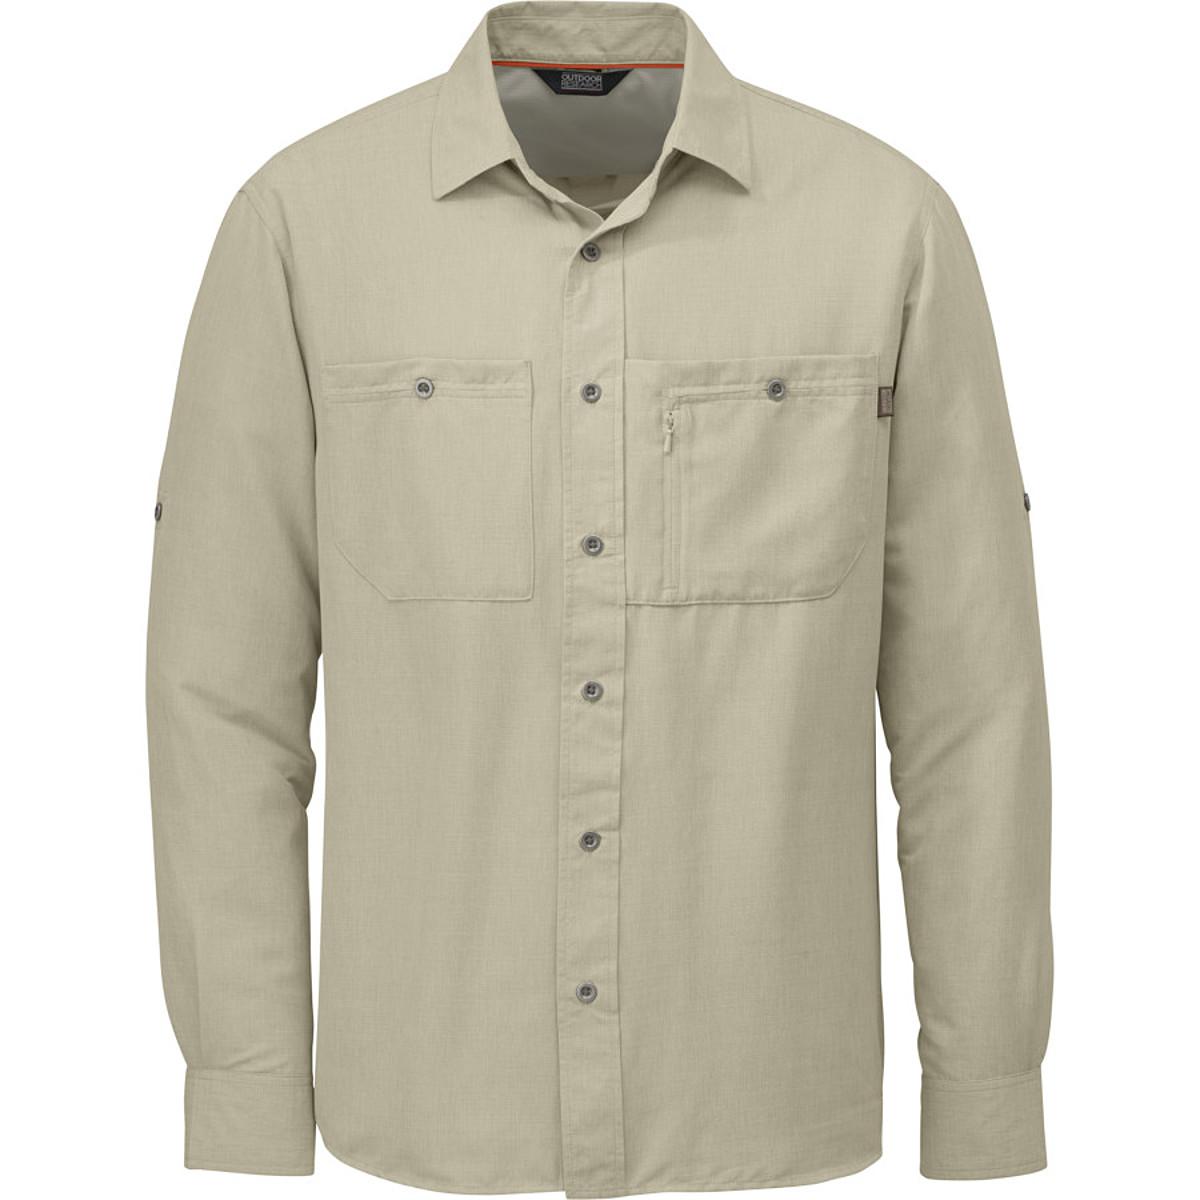 Outdoor Research Wayward Sentinel L/S Shirt